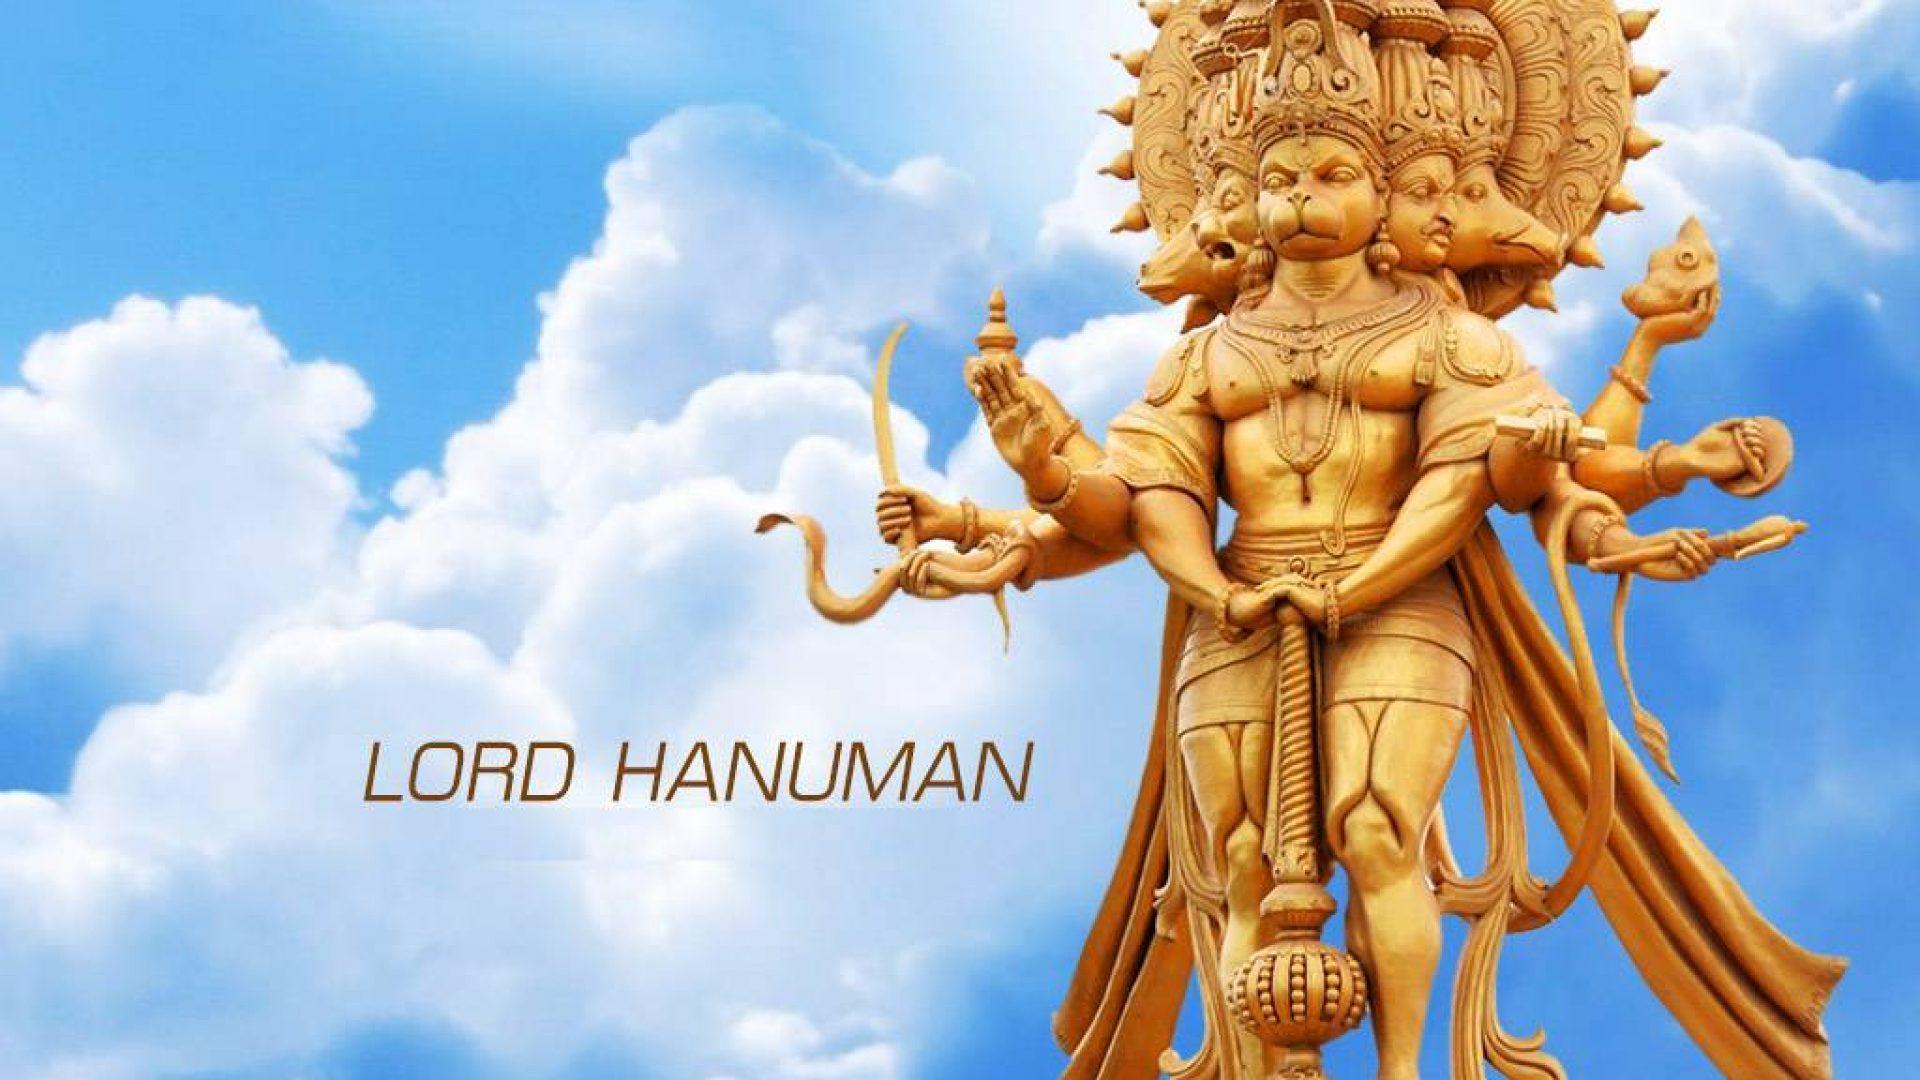 Panchmukhi Panchmukhi Hanuman Wallpaper Hindu Gods And Goddesses